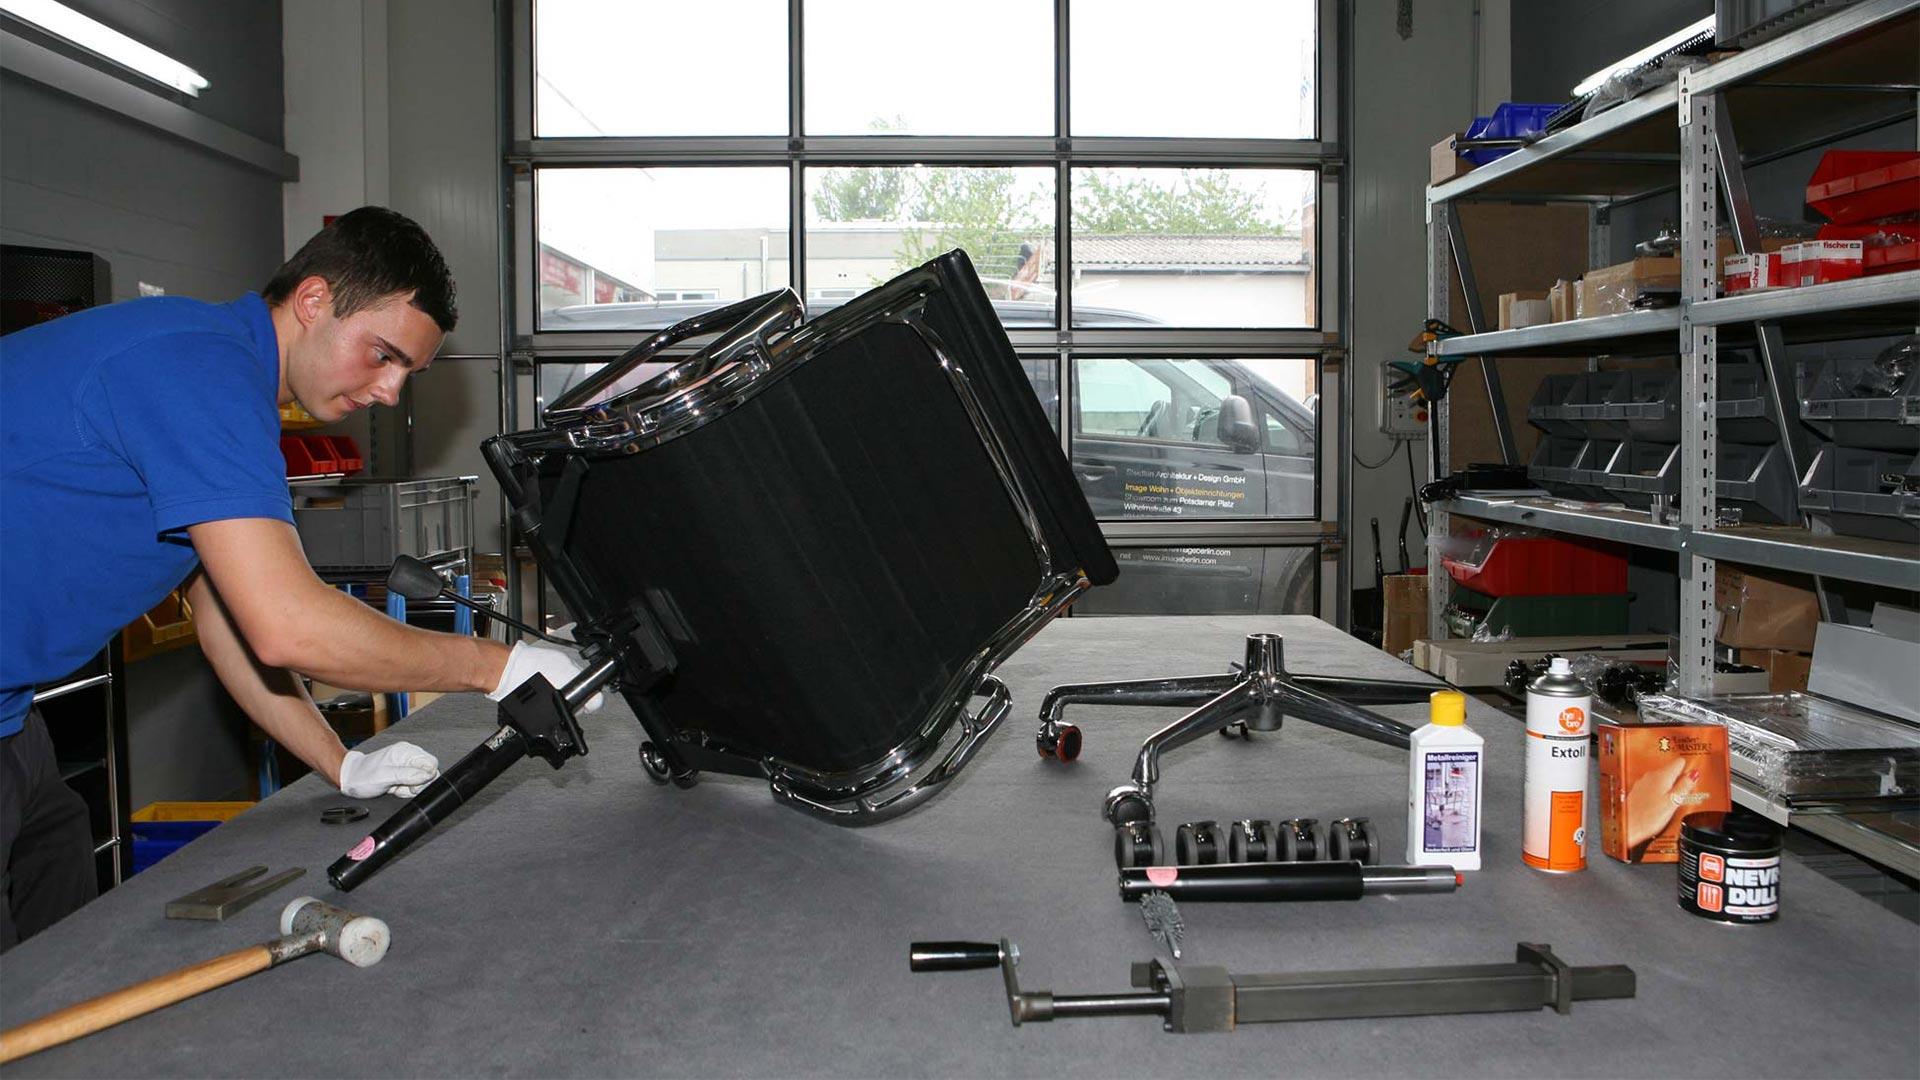 Vitra Ersatzteilservice + Reparatur Eames alu Chair in Berlin bei steidten+03